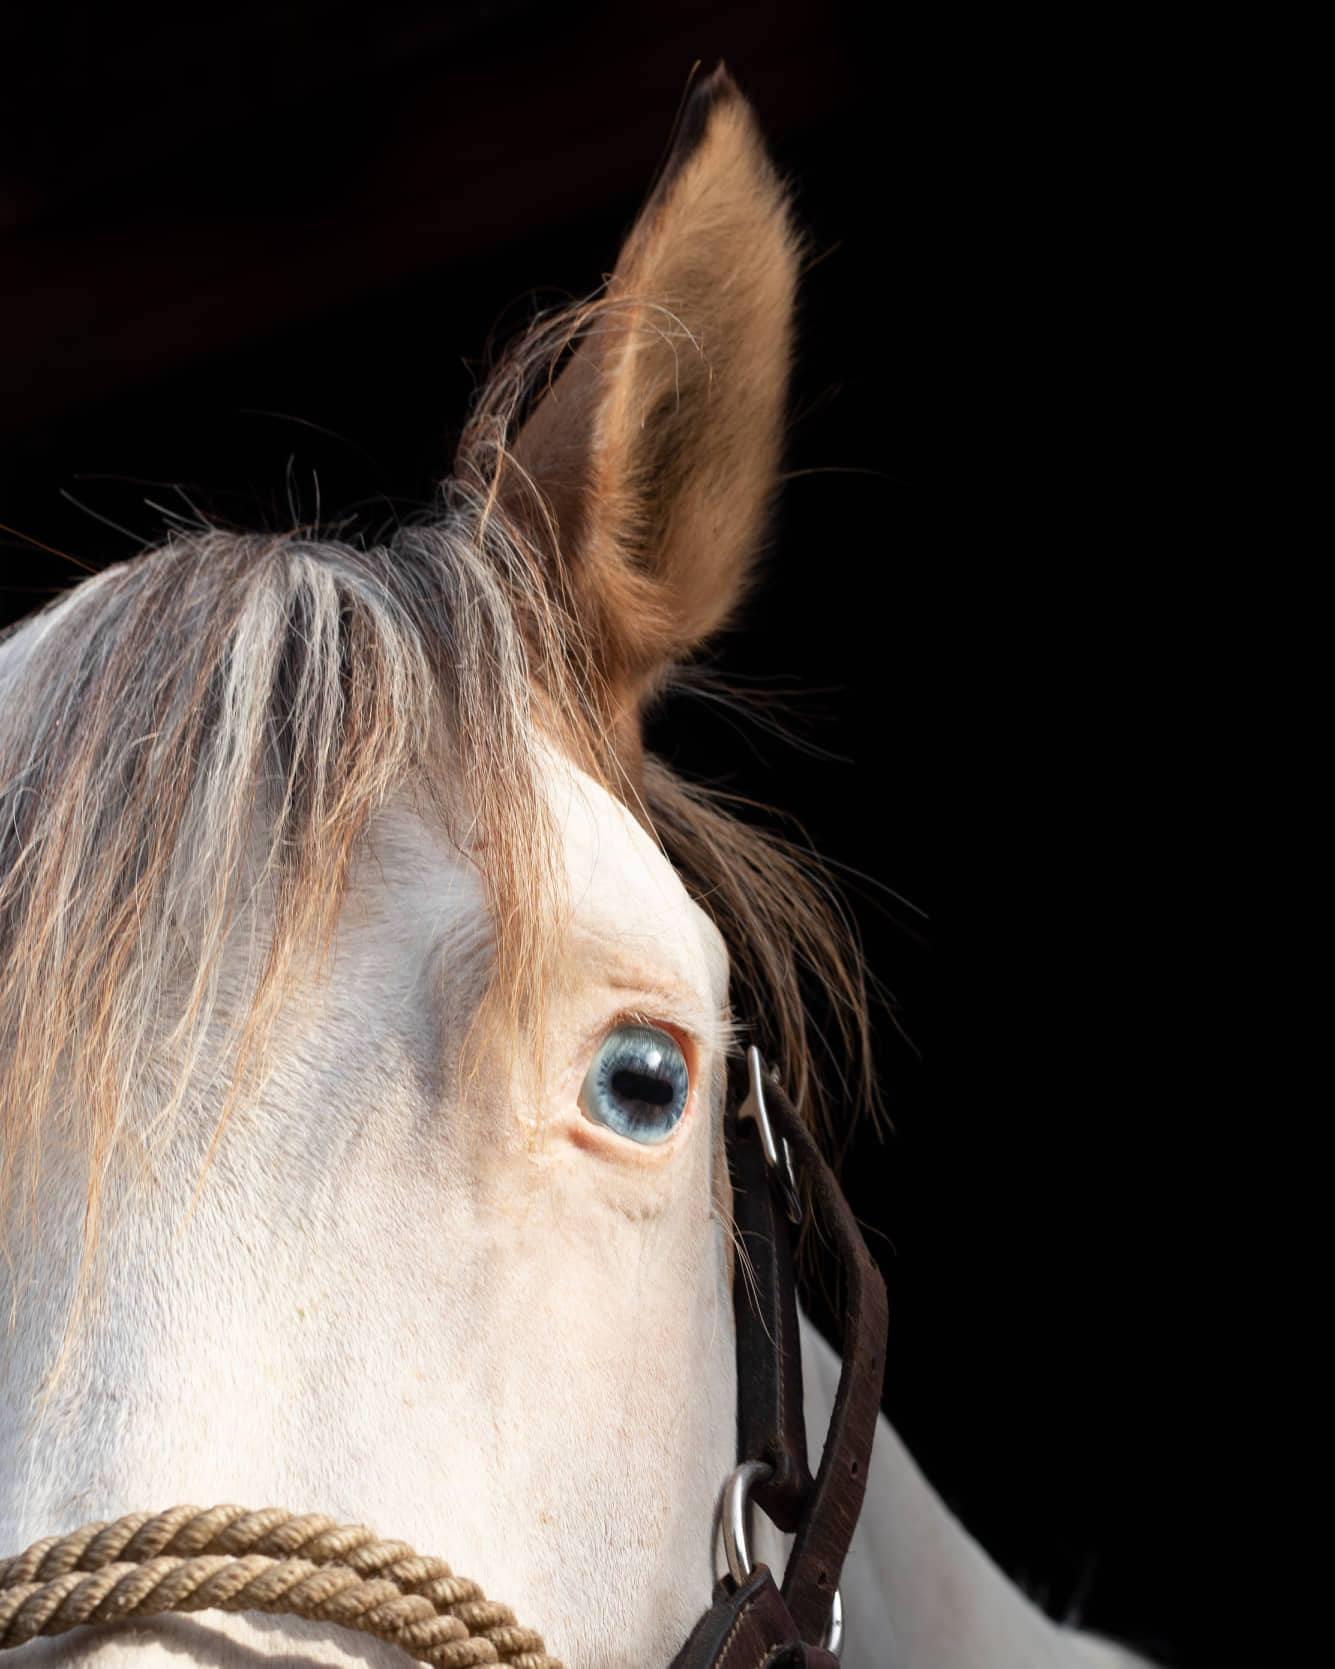 Animals Teach Us - Walk with Horses